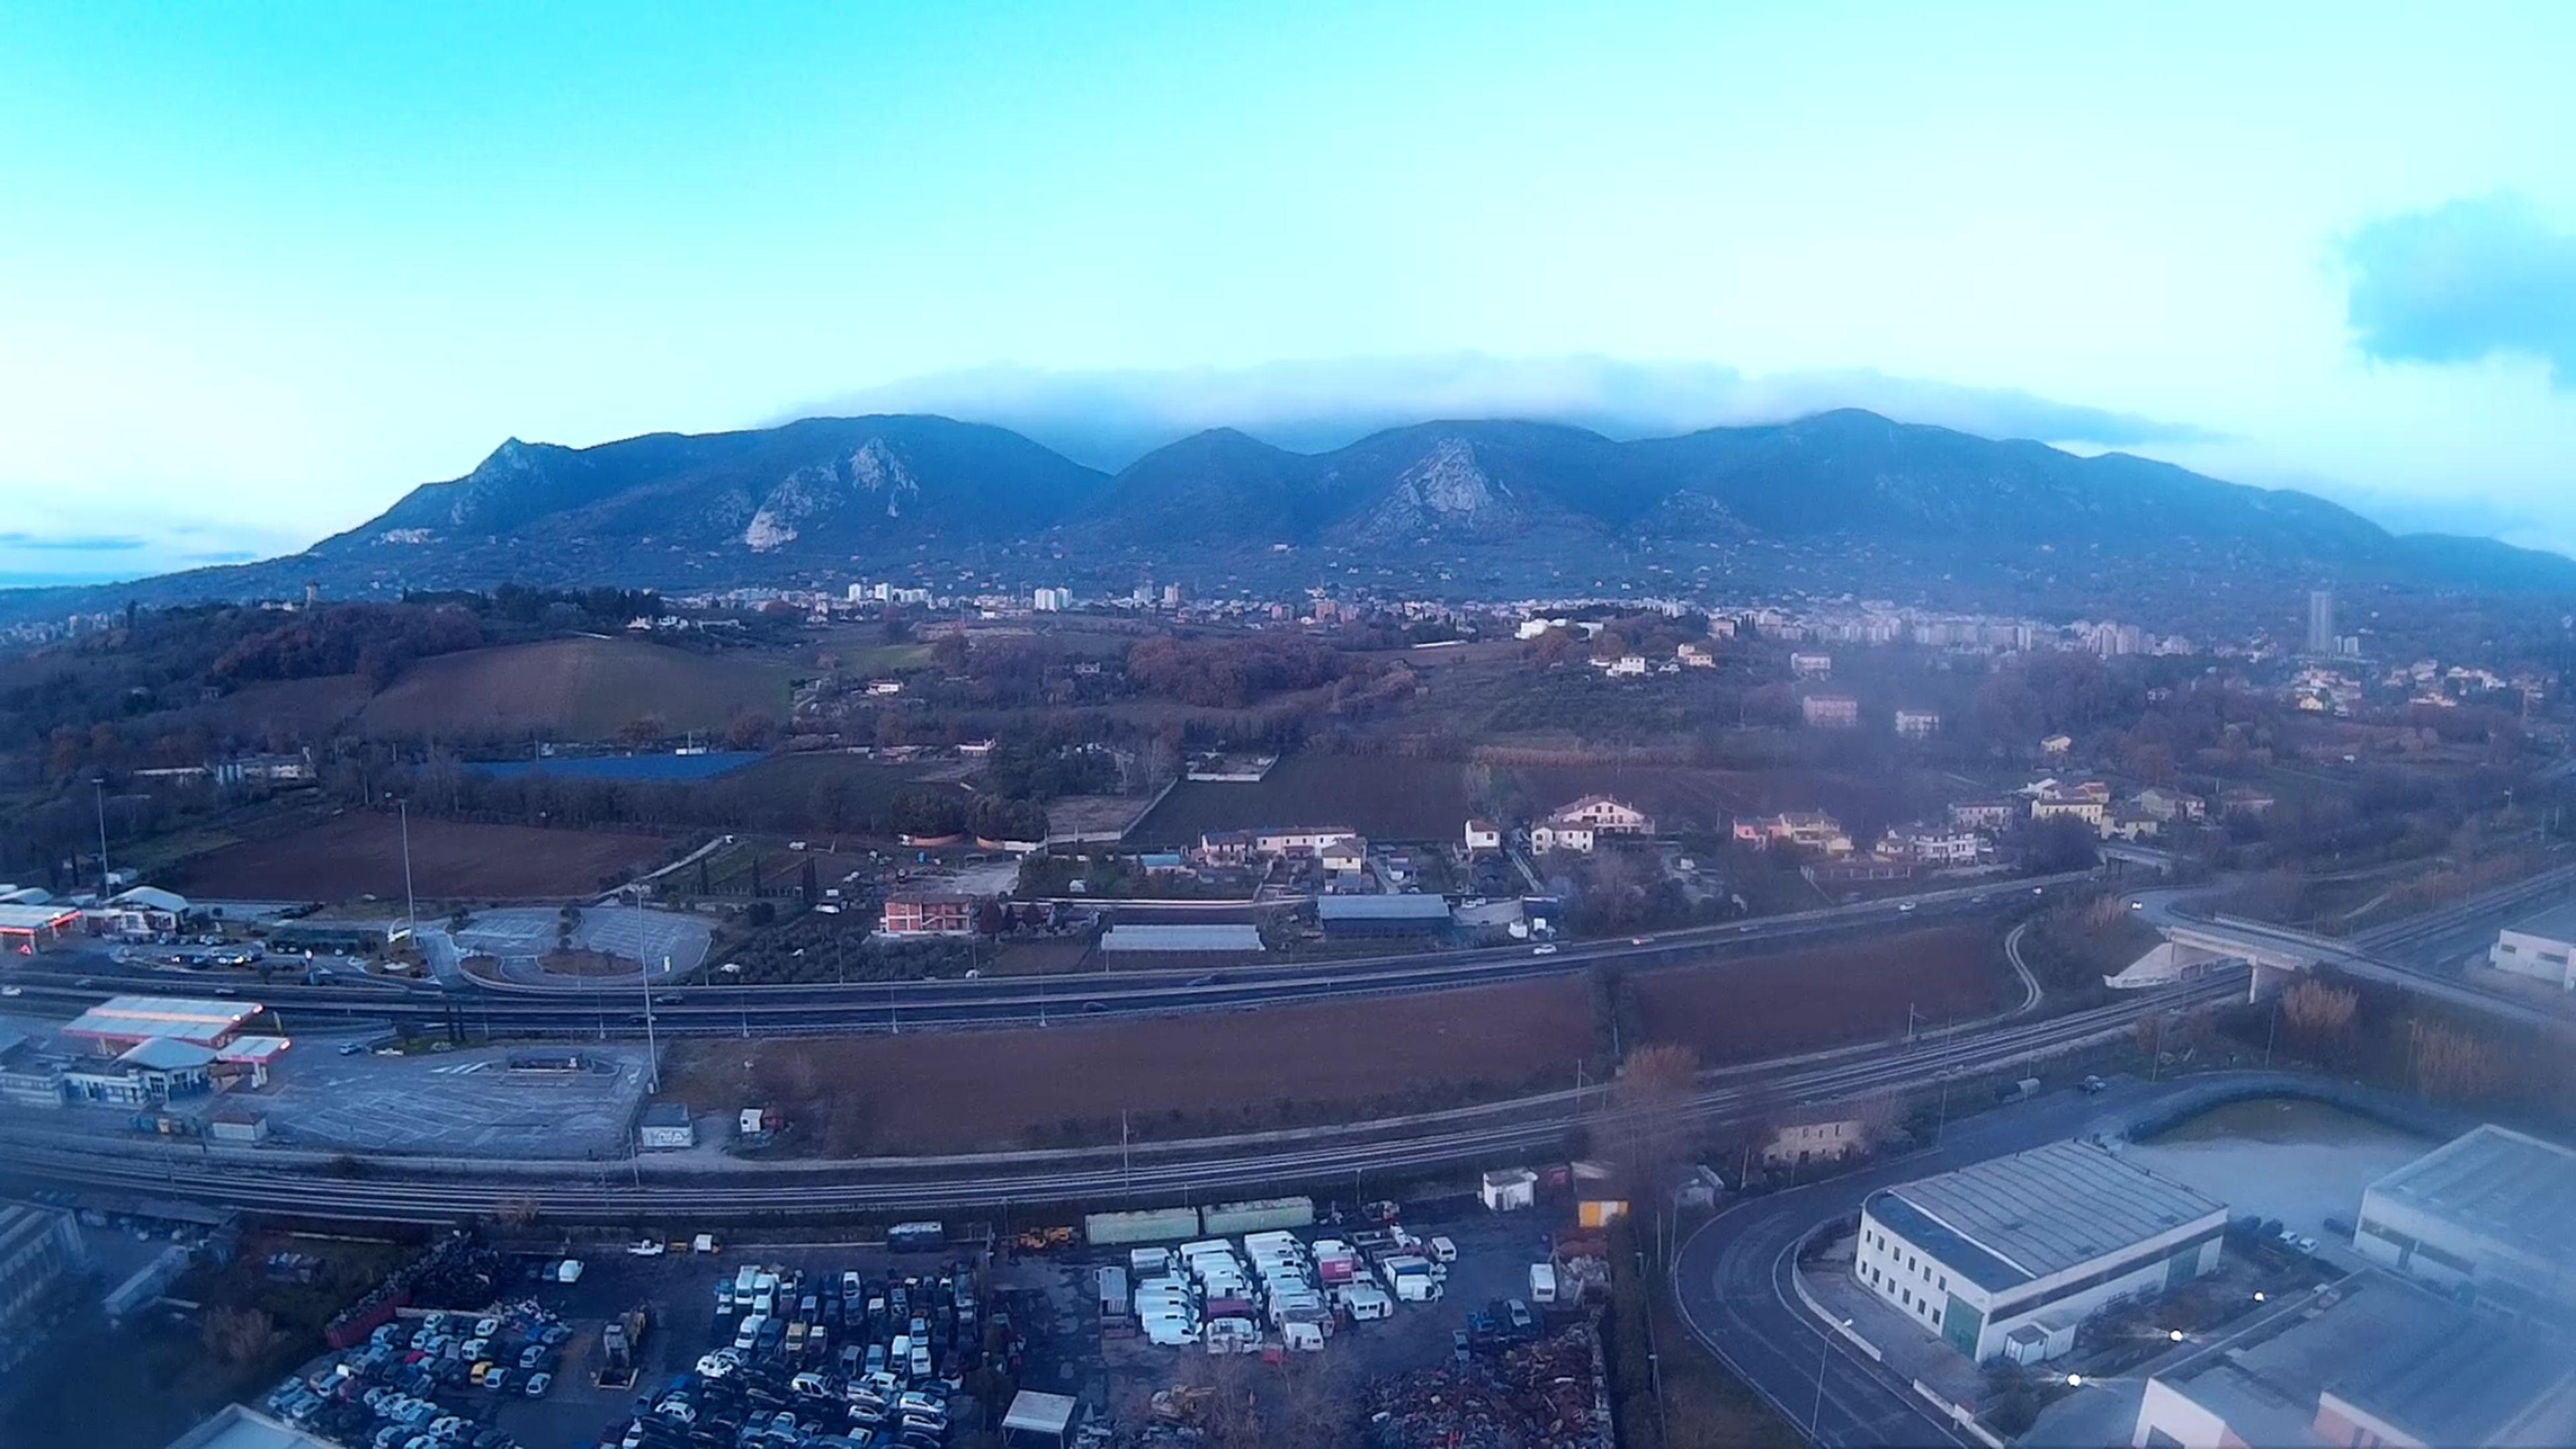 Dji Phantom Ripreseaeree Cinematografico Fotodrone Droni Drone In Opera Terni 😍 Umbria Italy❤️ Dji Future Dji Global Dji Pilot